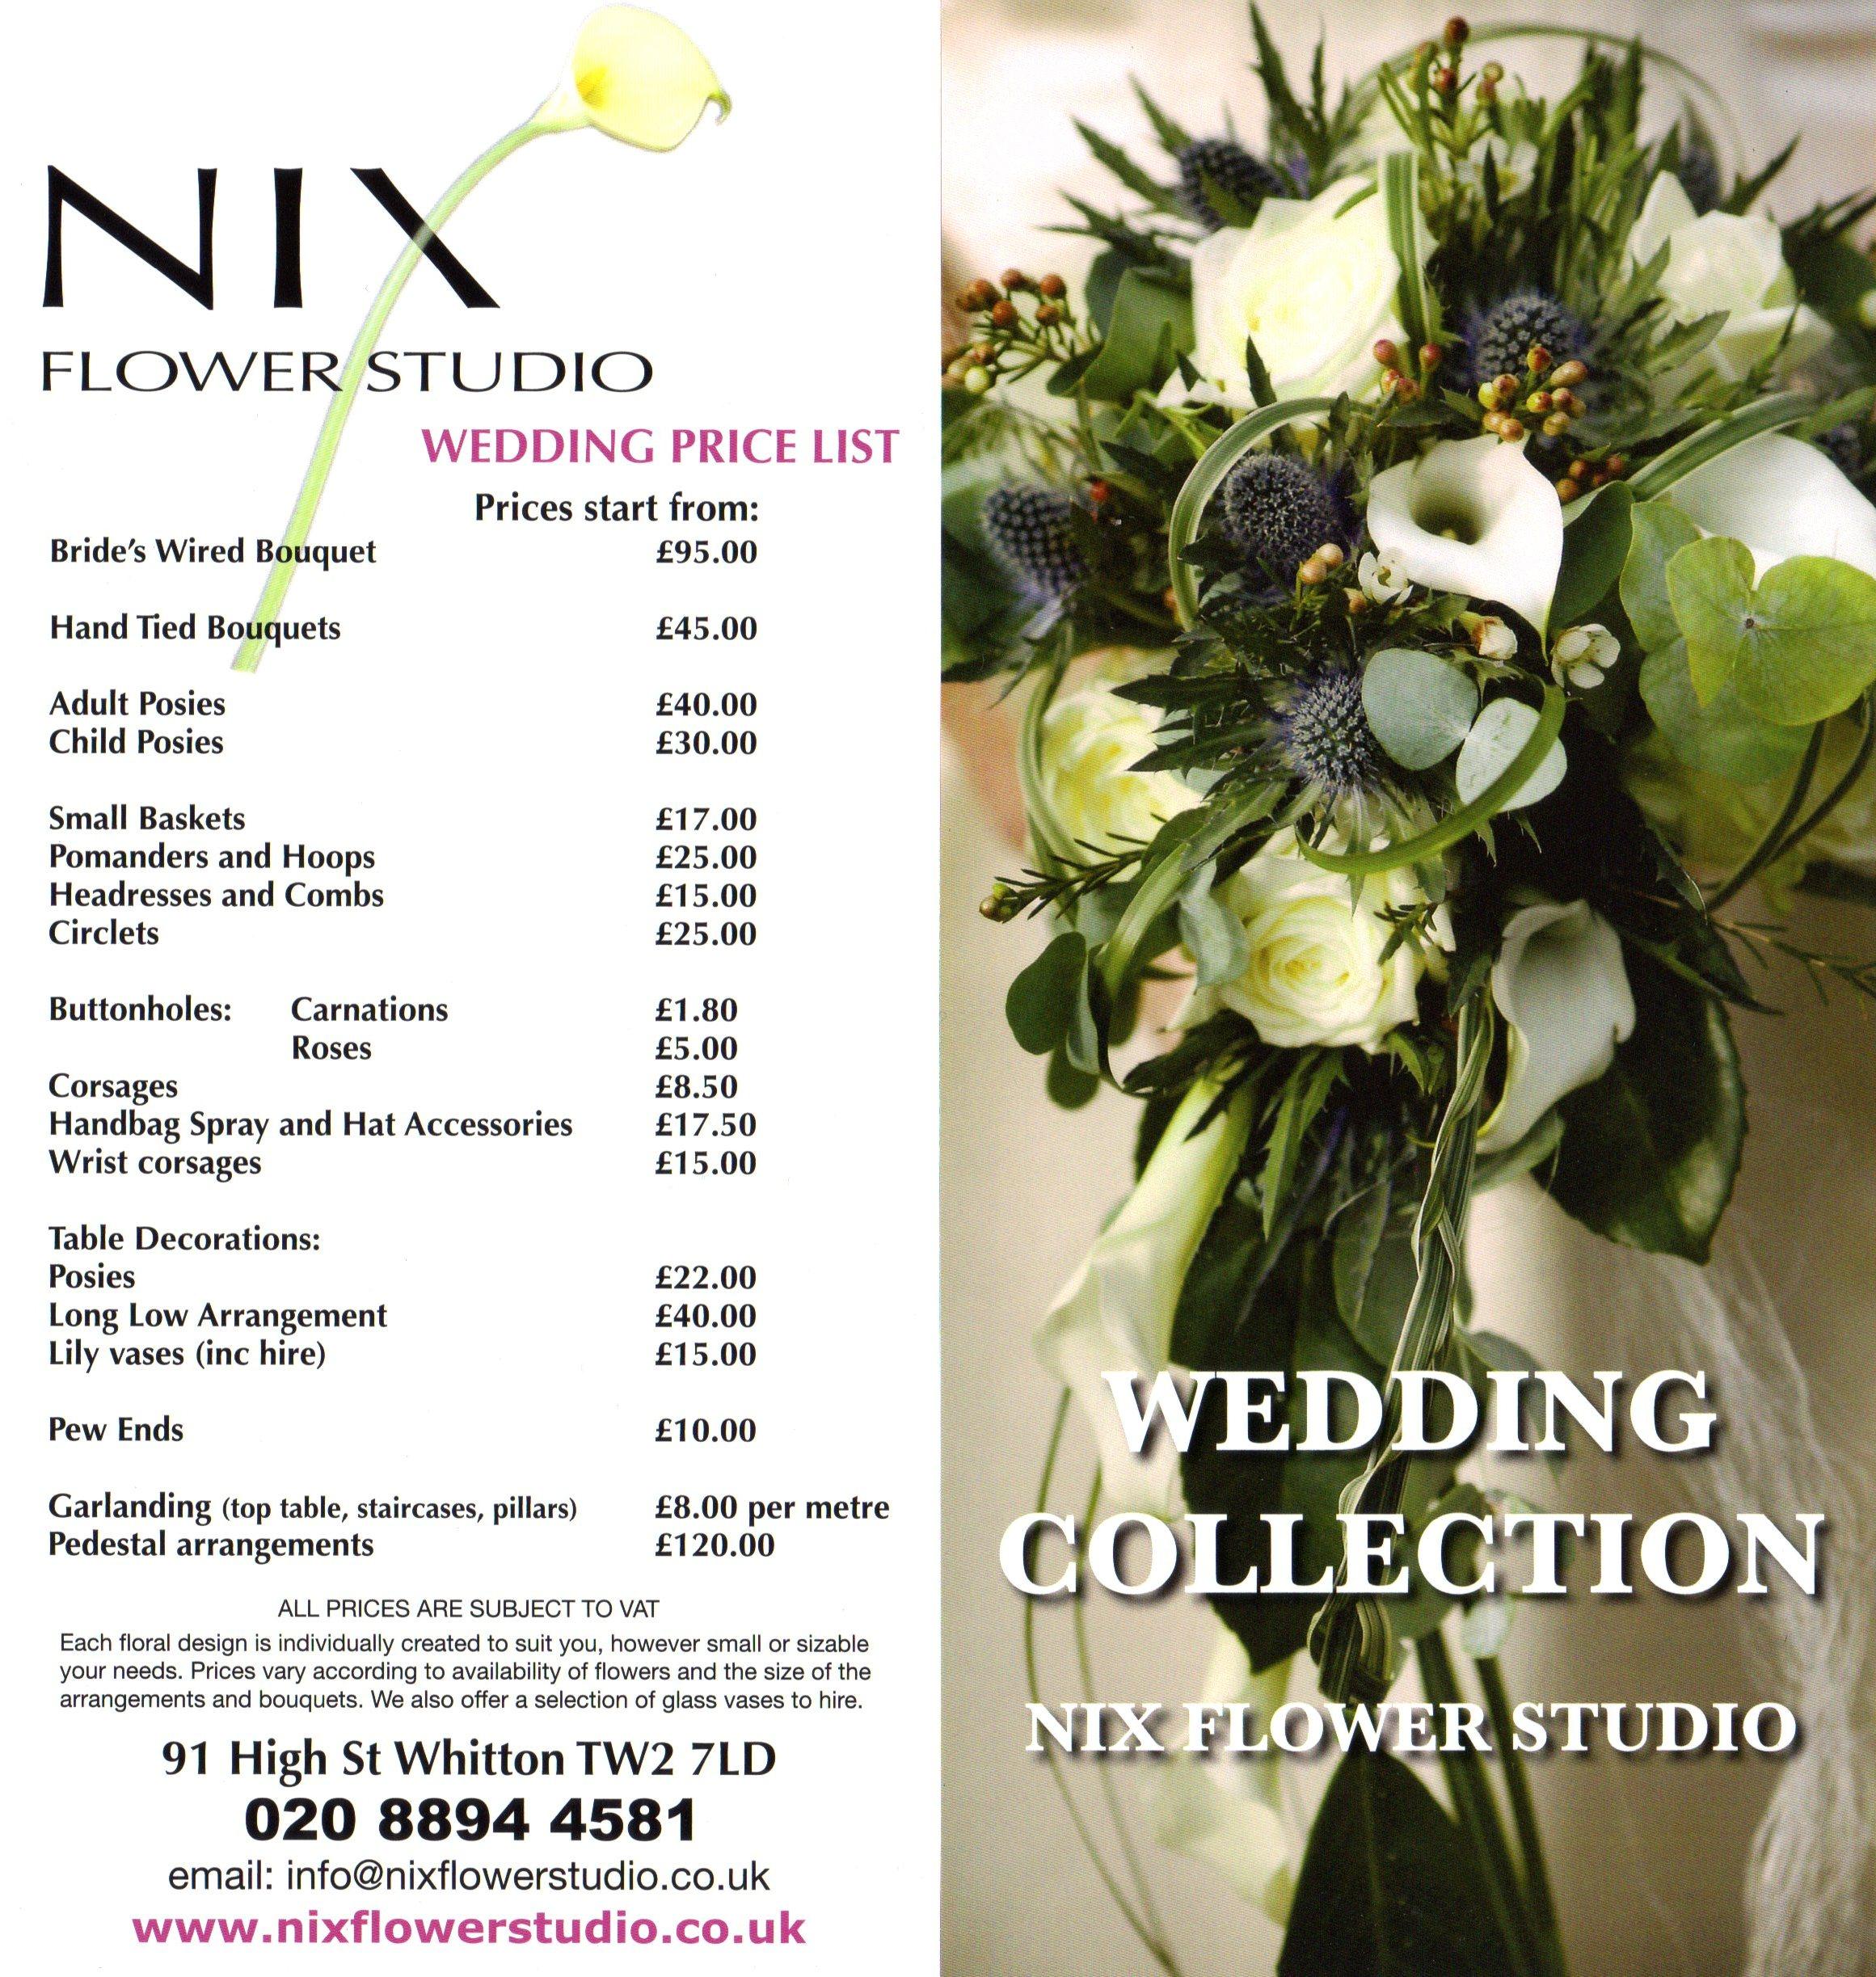 Prices Of Wedding Flowers: Nix Flower Studio